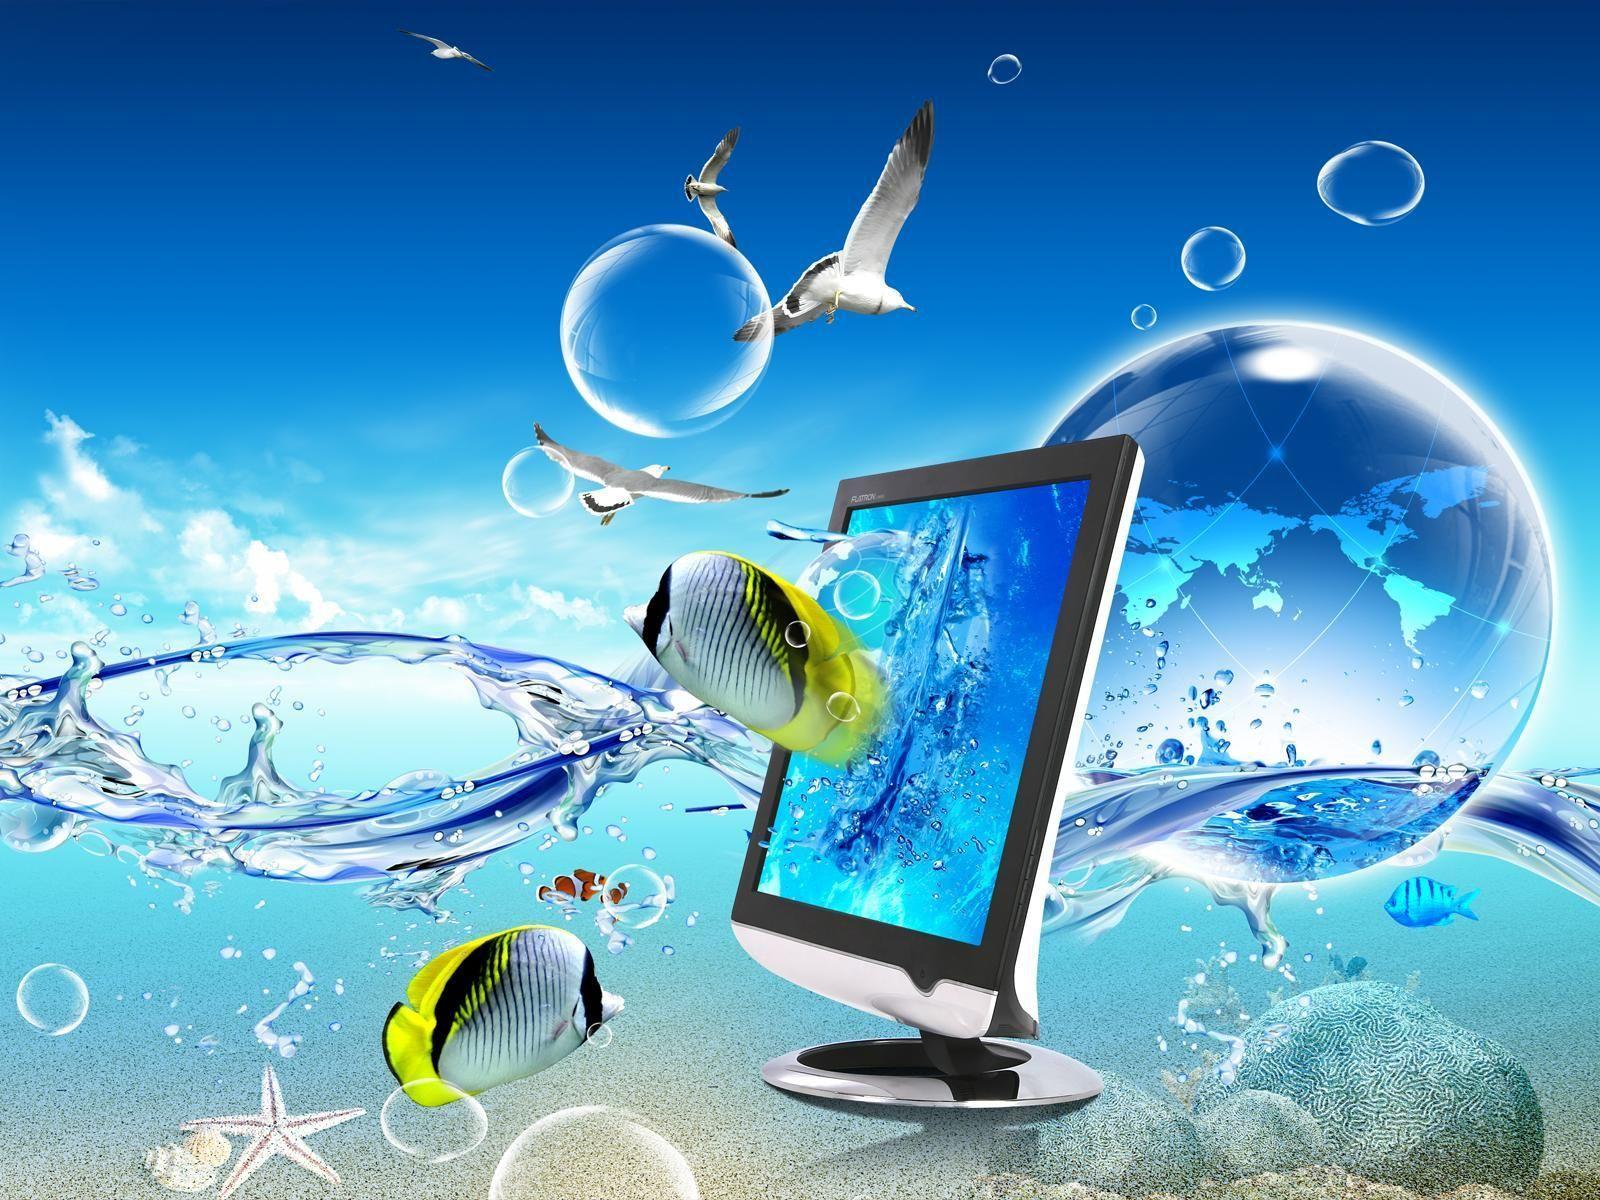 Wallpaper For Laptop Free Download